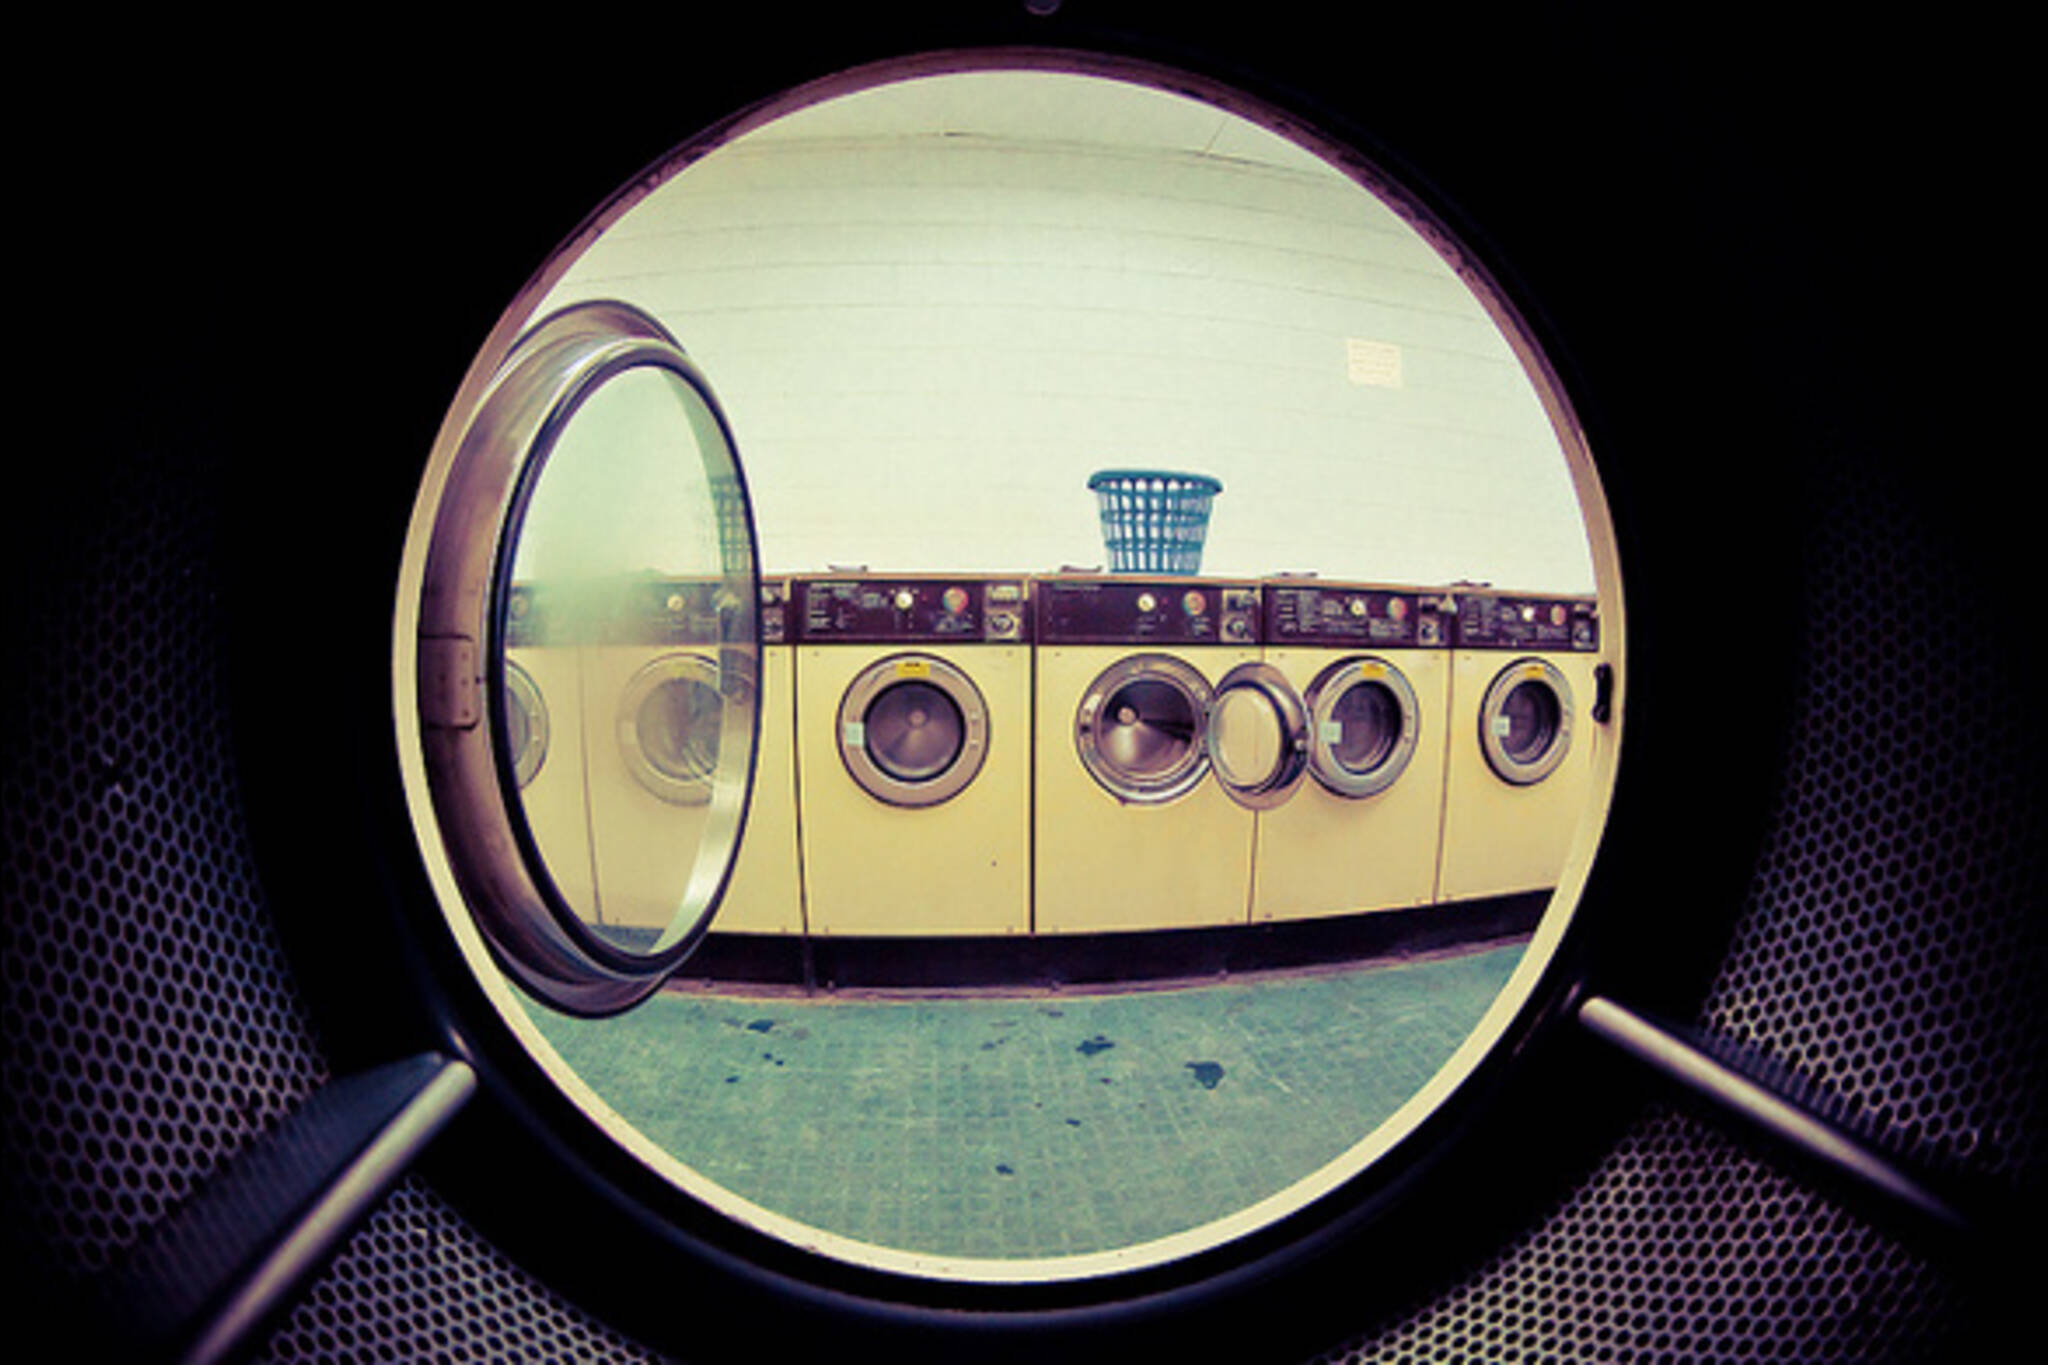 Toronto Laundromat